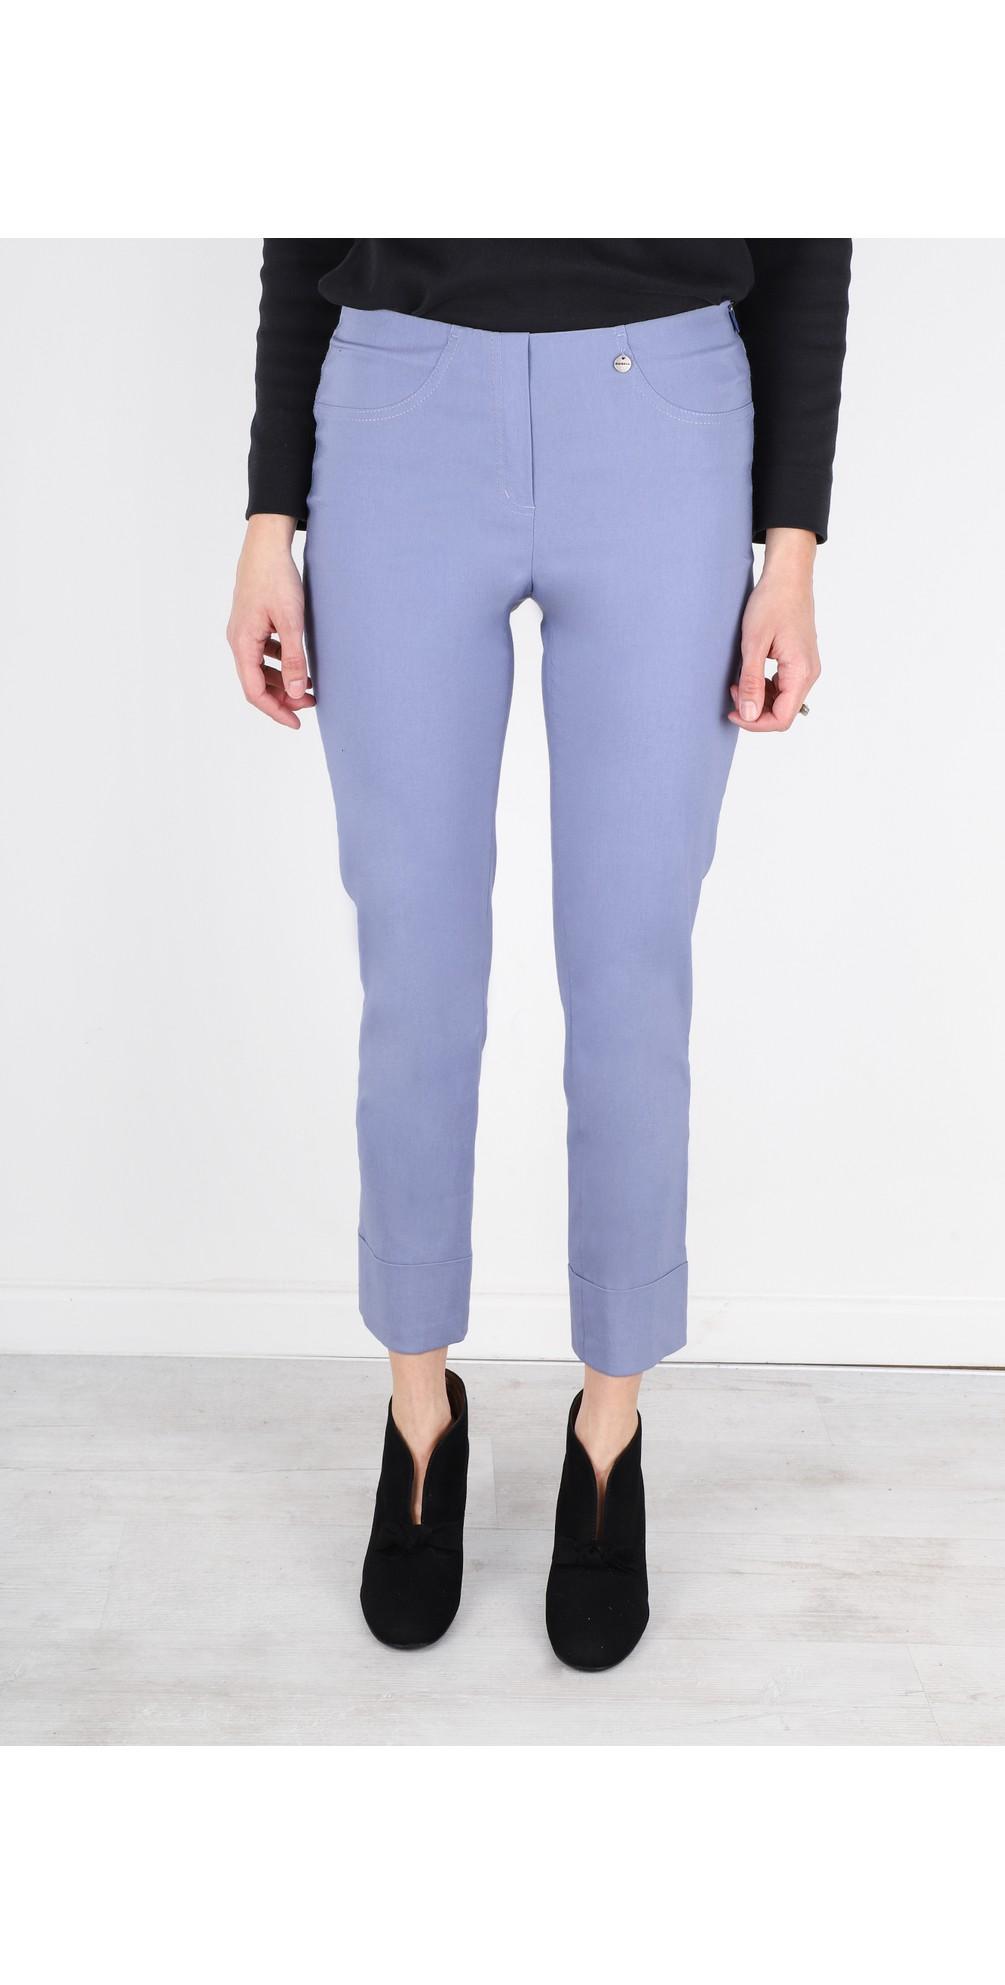 Bella 09 Denim Blue Ankle Length Crop Cuff Trouser main image